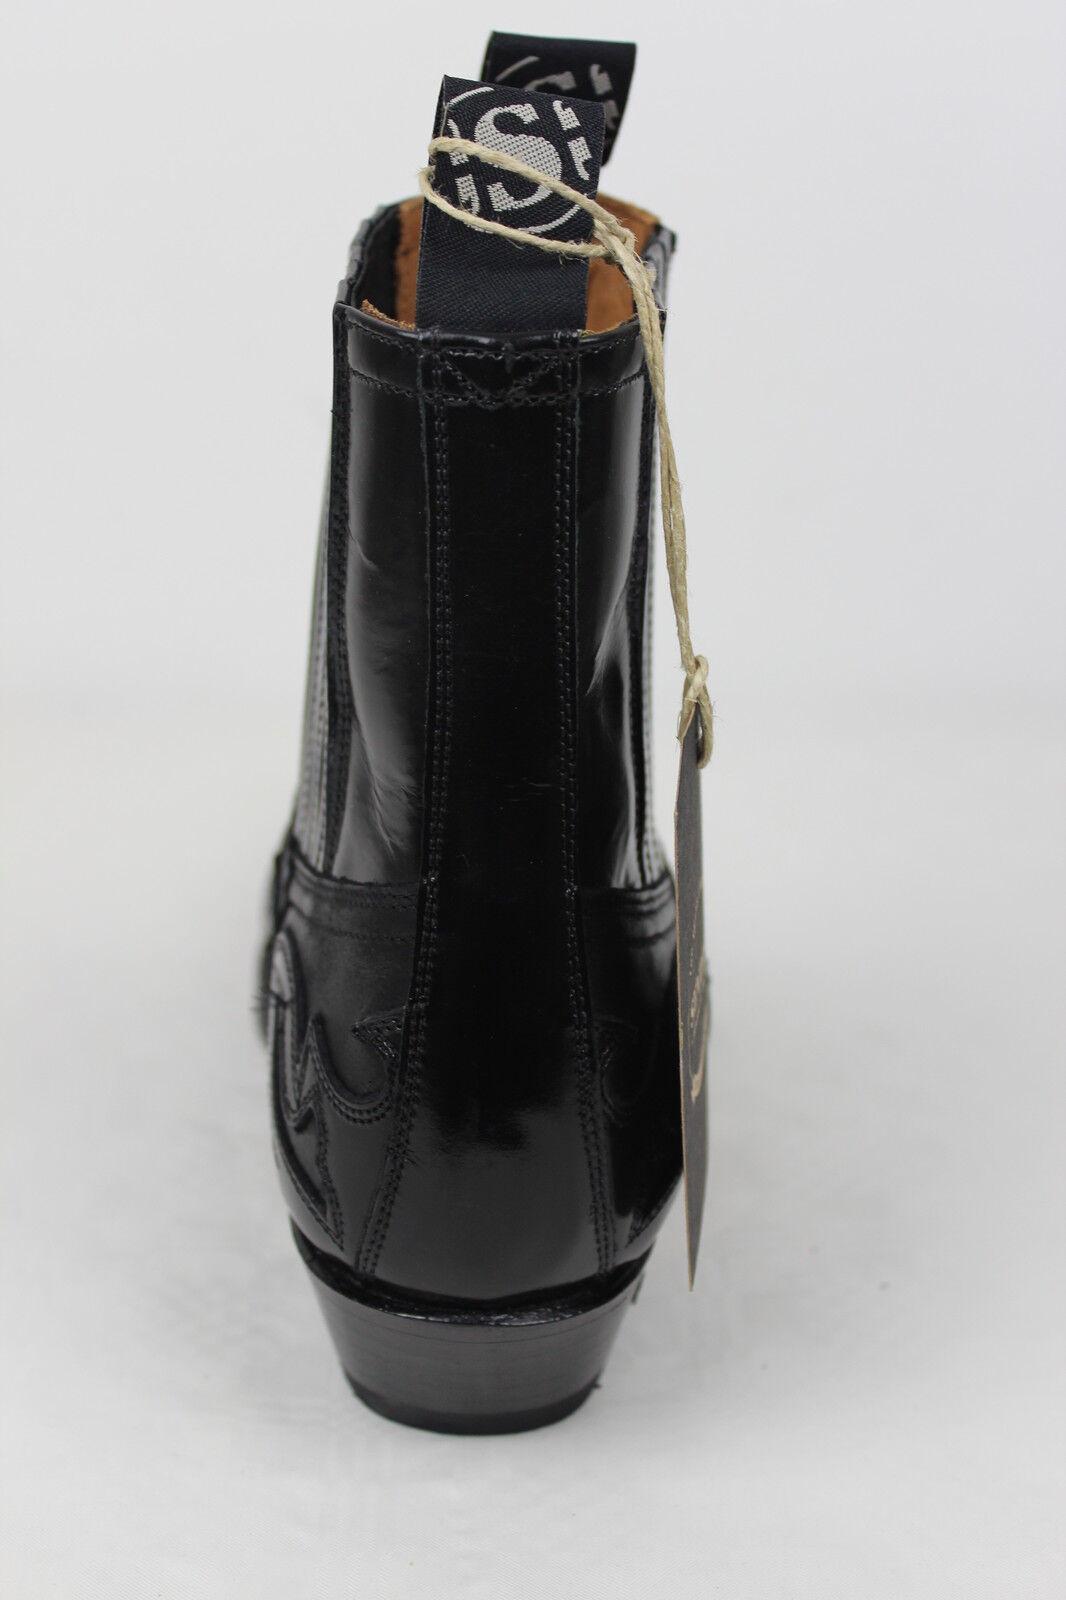 Sendra Boots Boots Boots Cowboystiefel Westernstiefel  4660 Schwarz b8e397